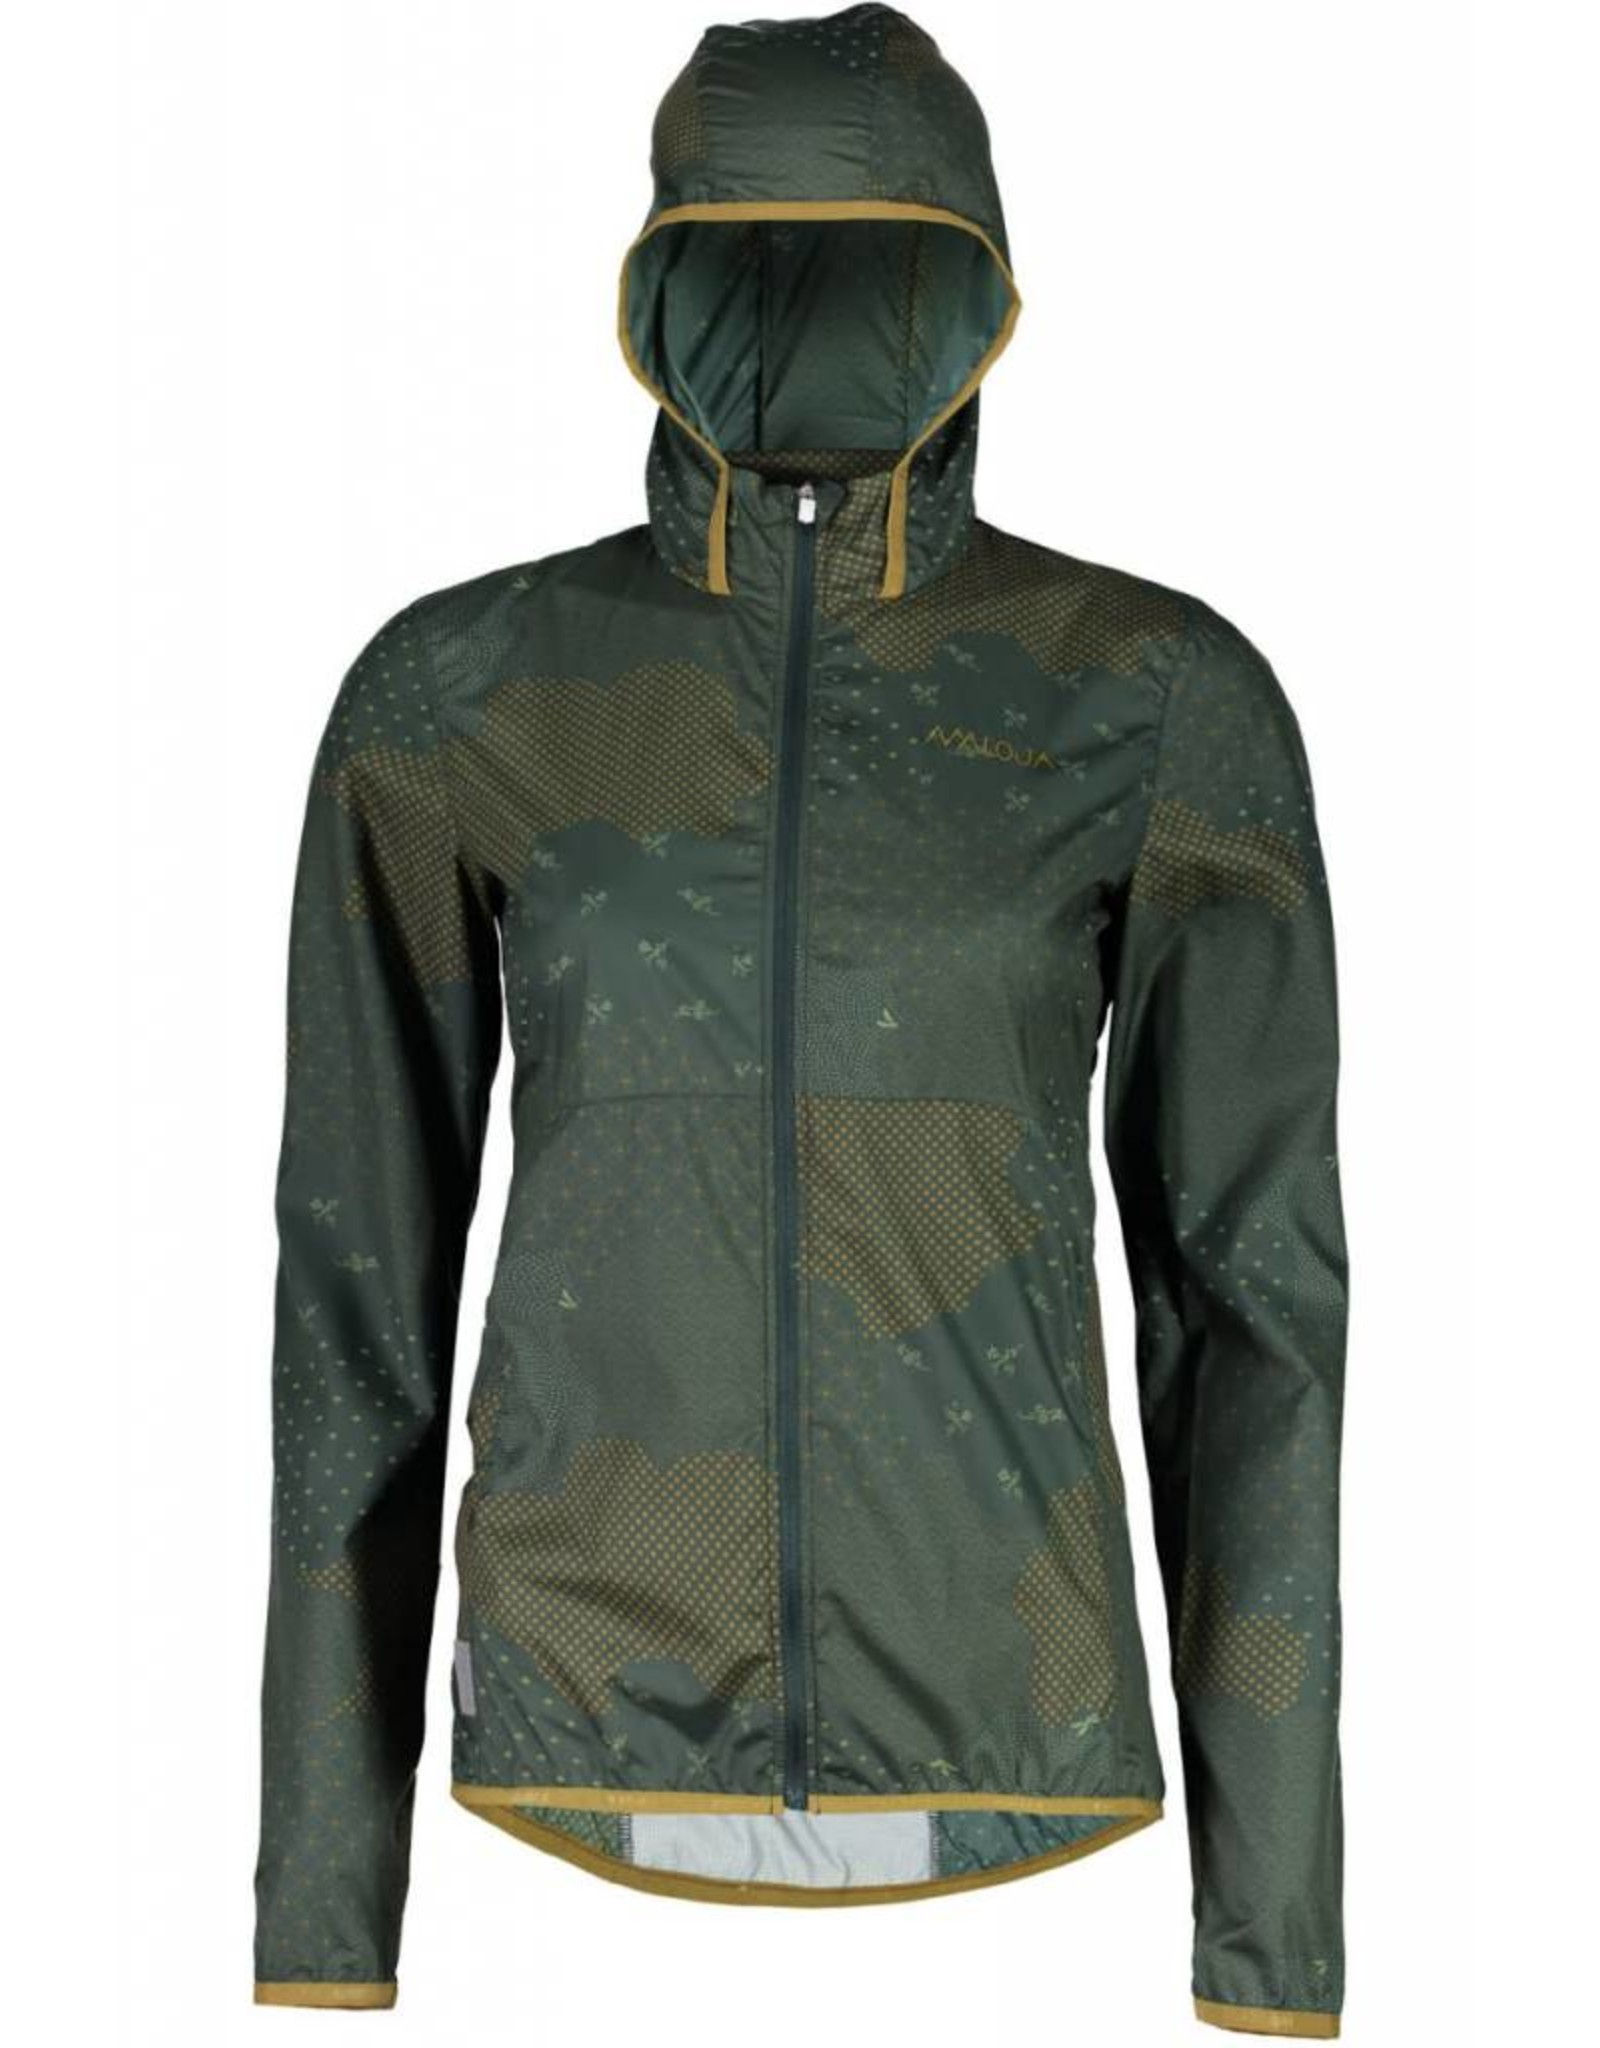 Maloja Ws BinaM Jacket